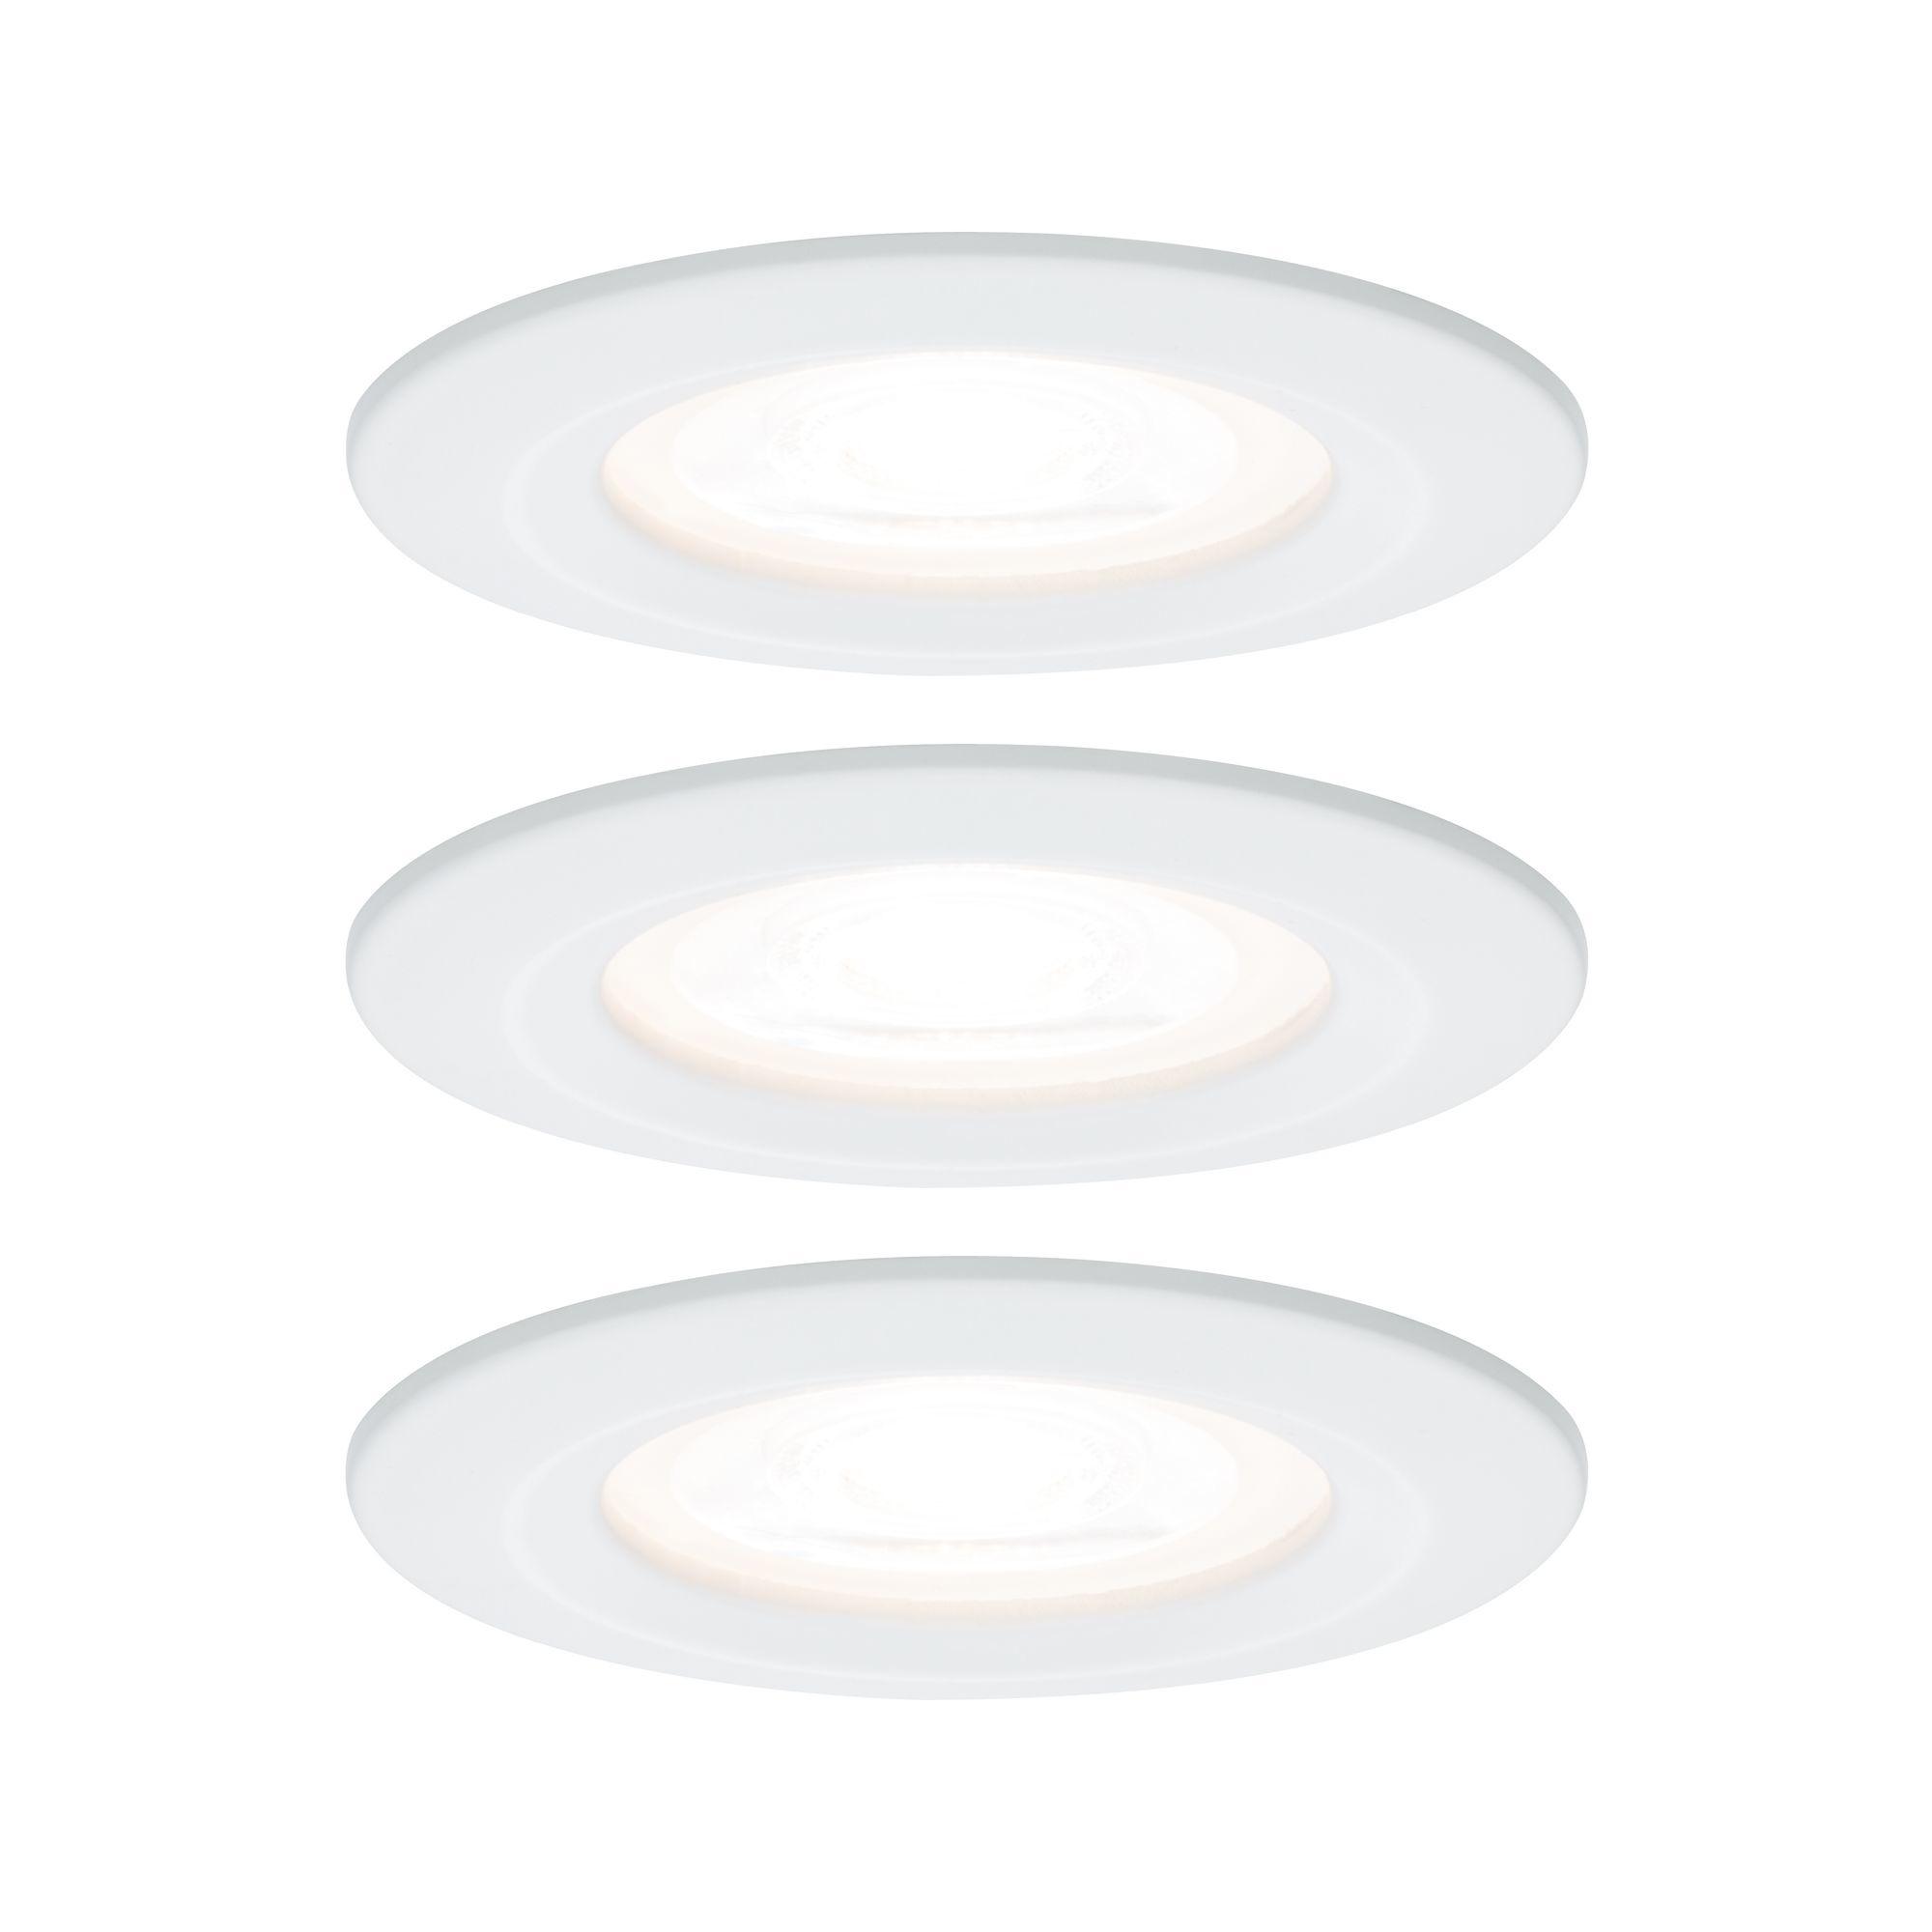 Paulmann EBL Set Nova rd starr LED IP44 3-stepdim3x6,5W 230V GU10 51mm Weiß matt/Alu